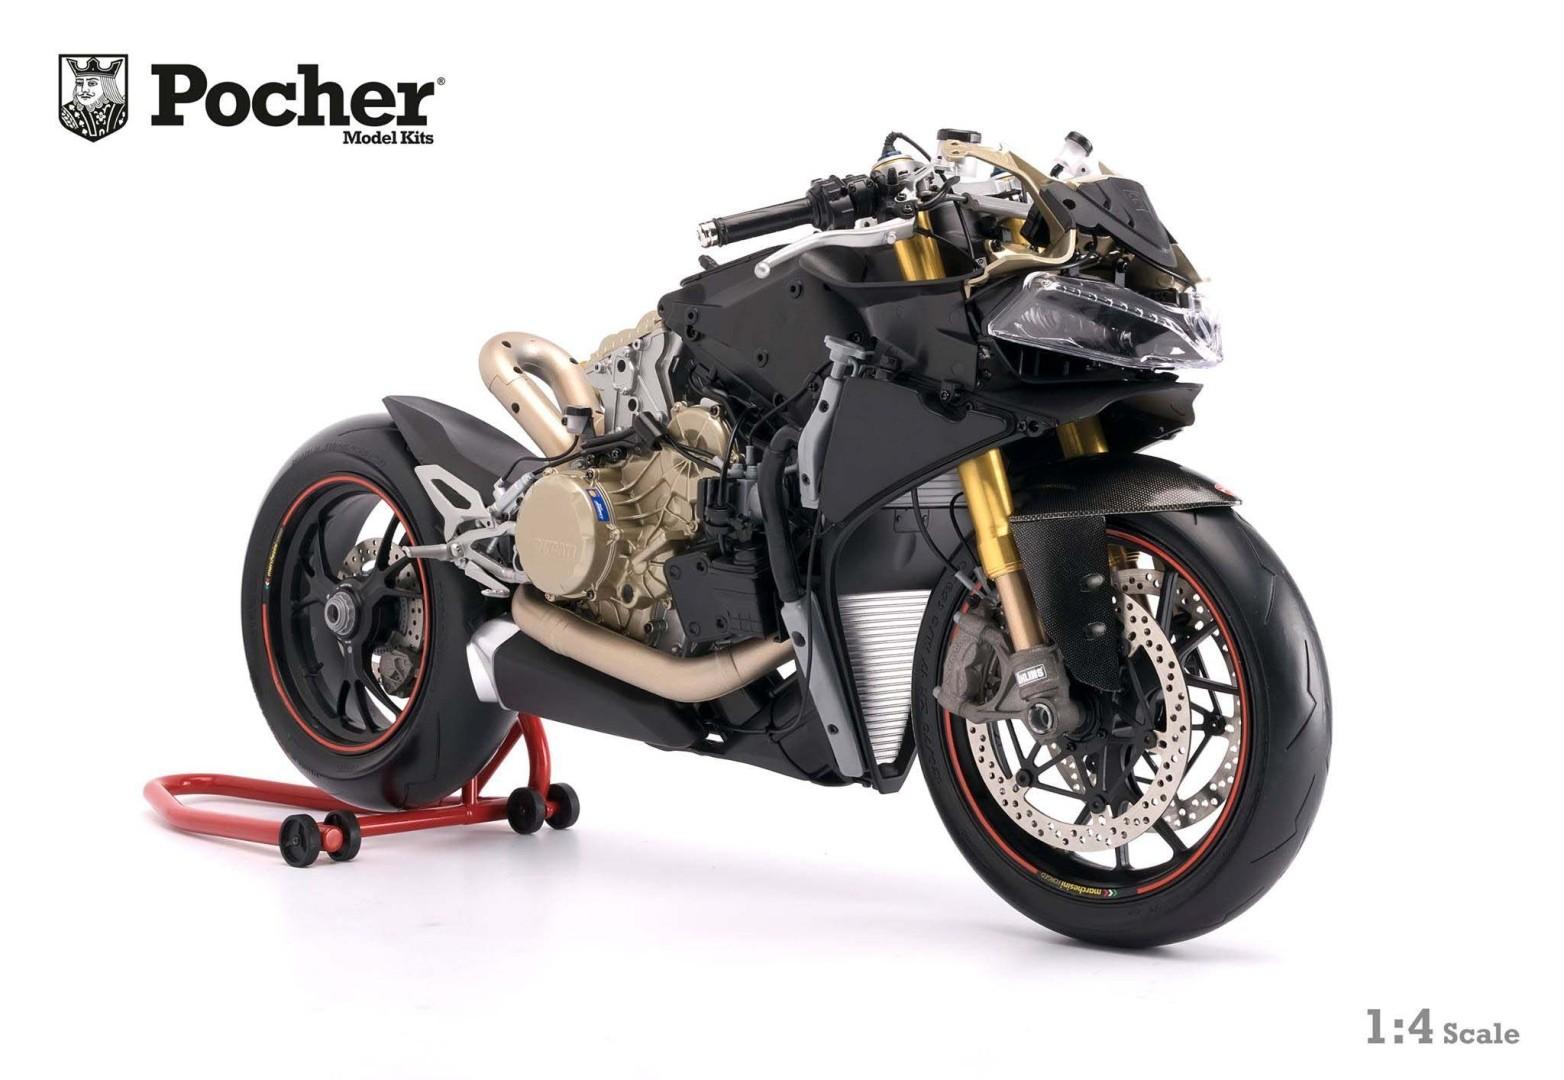 2017 Ducati Panigale 1299 S